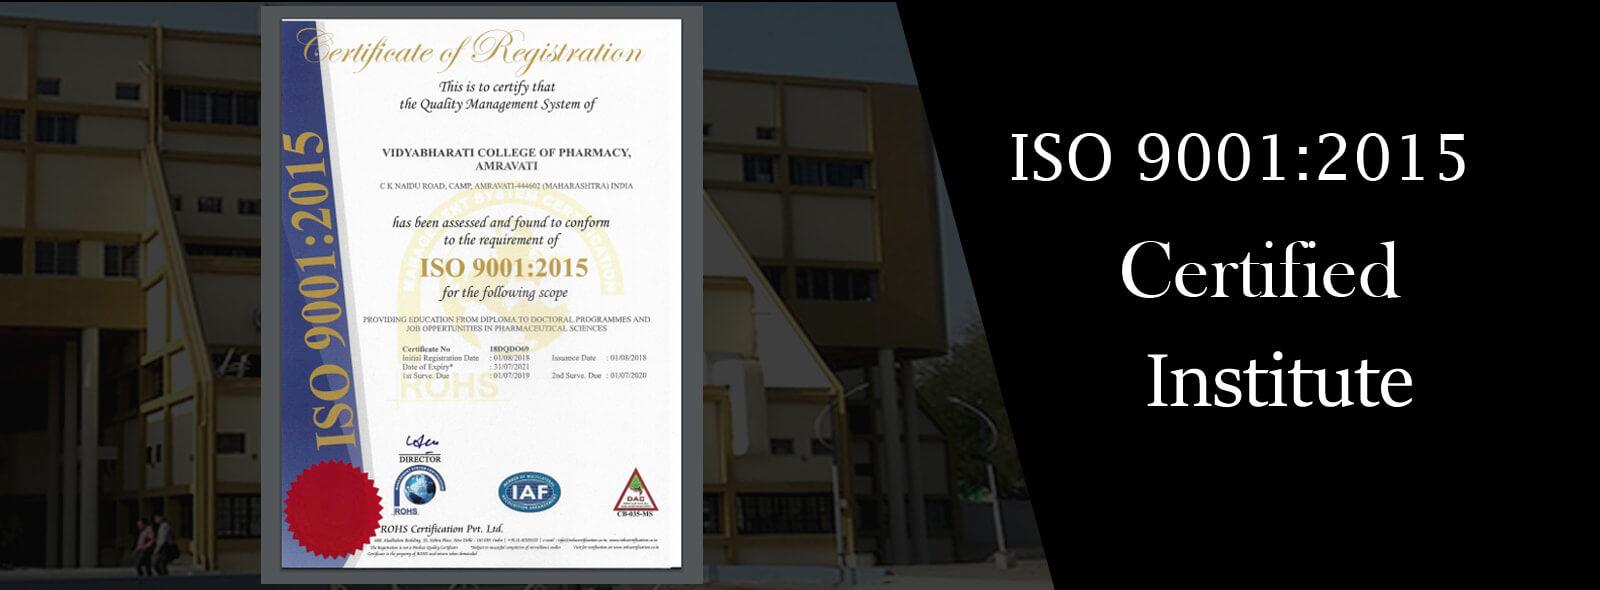 Index | Vidyabharti College Of Pharmacy